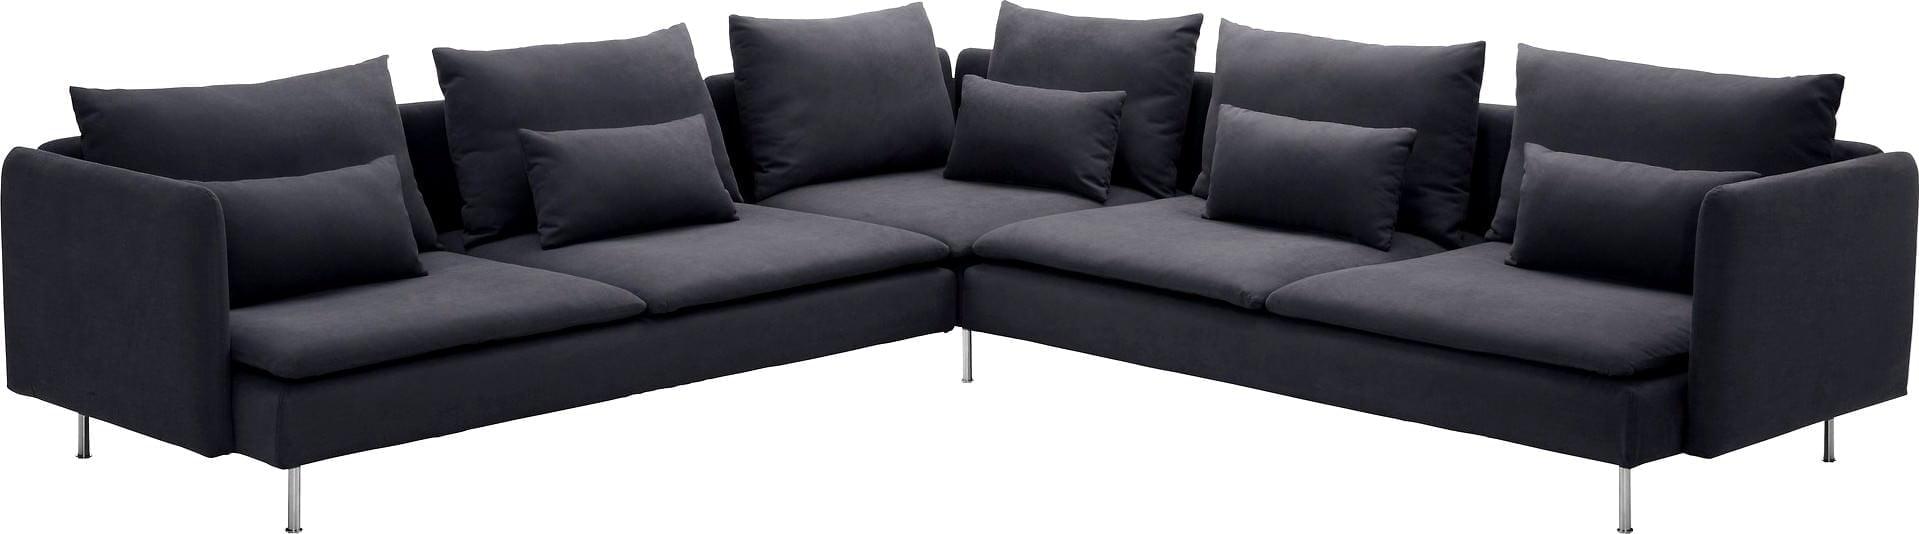 ikea-2015-kose-koltuk-modelleri-1